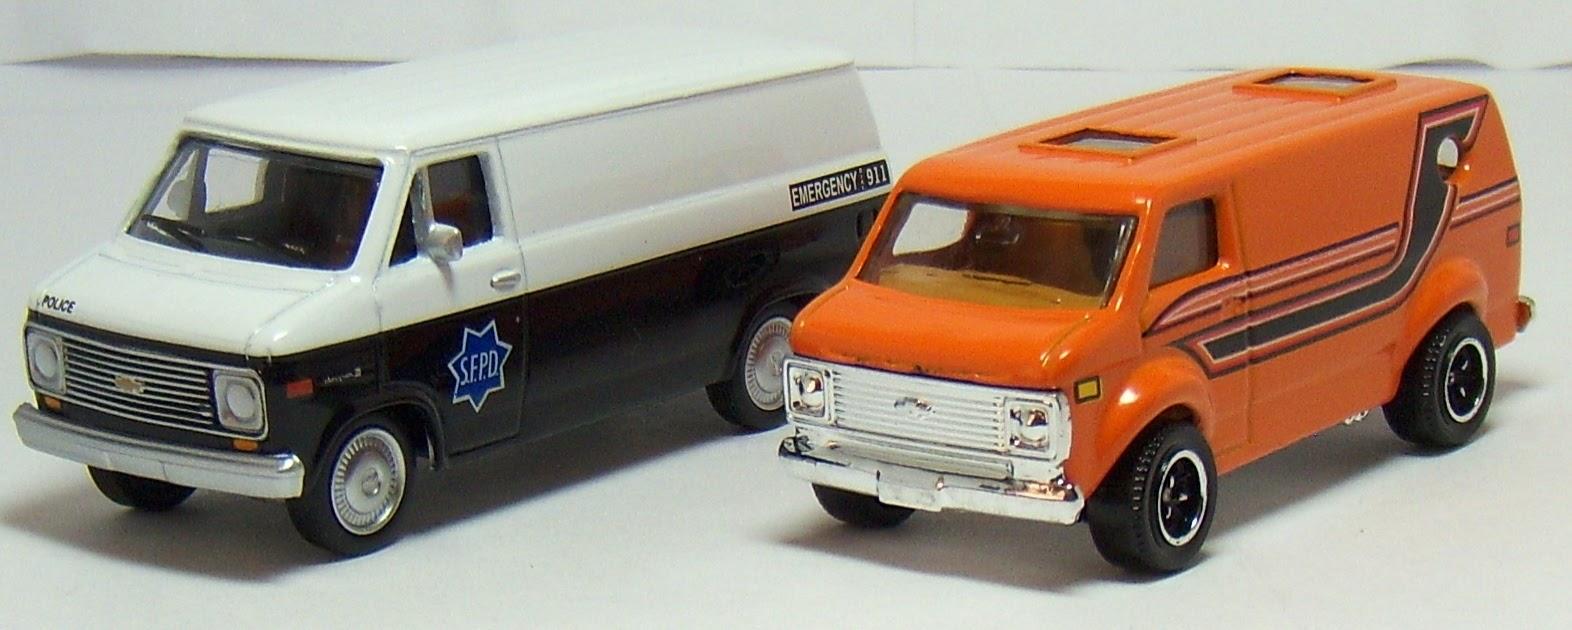 Two Lane Desktop: Greenlight 1977 Chevy G20 Van and Matchbox Chevy Van